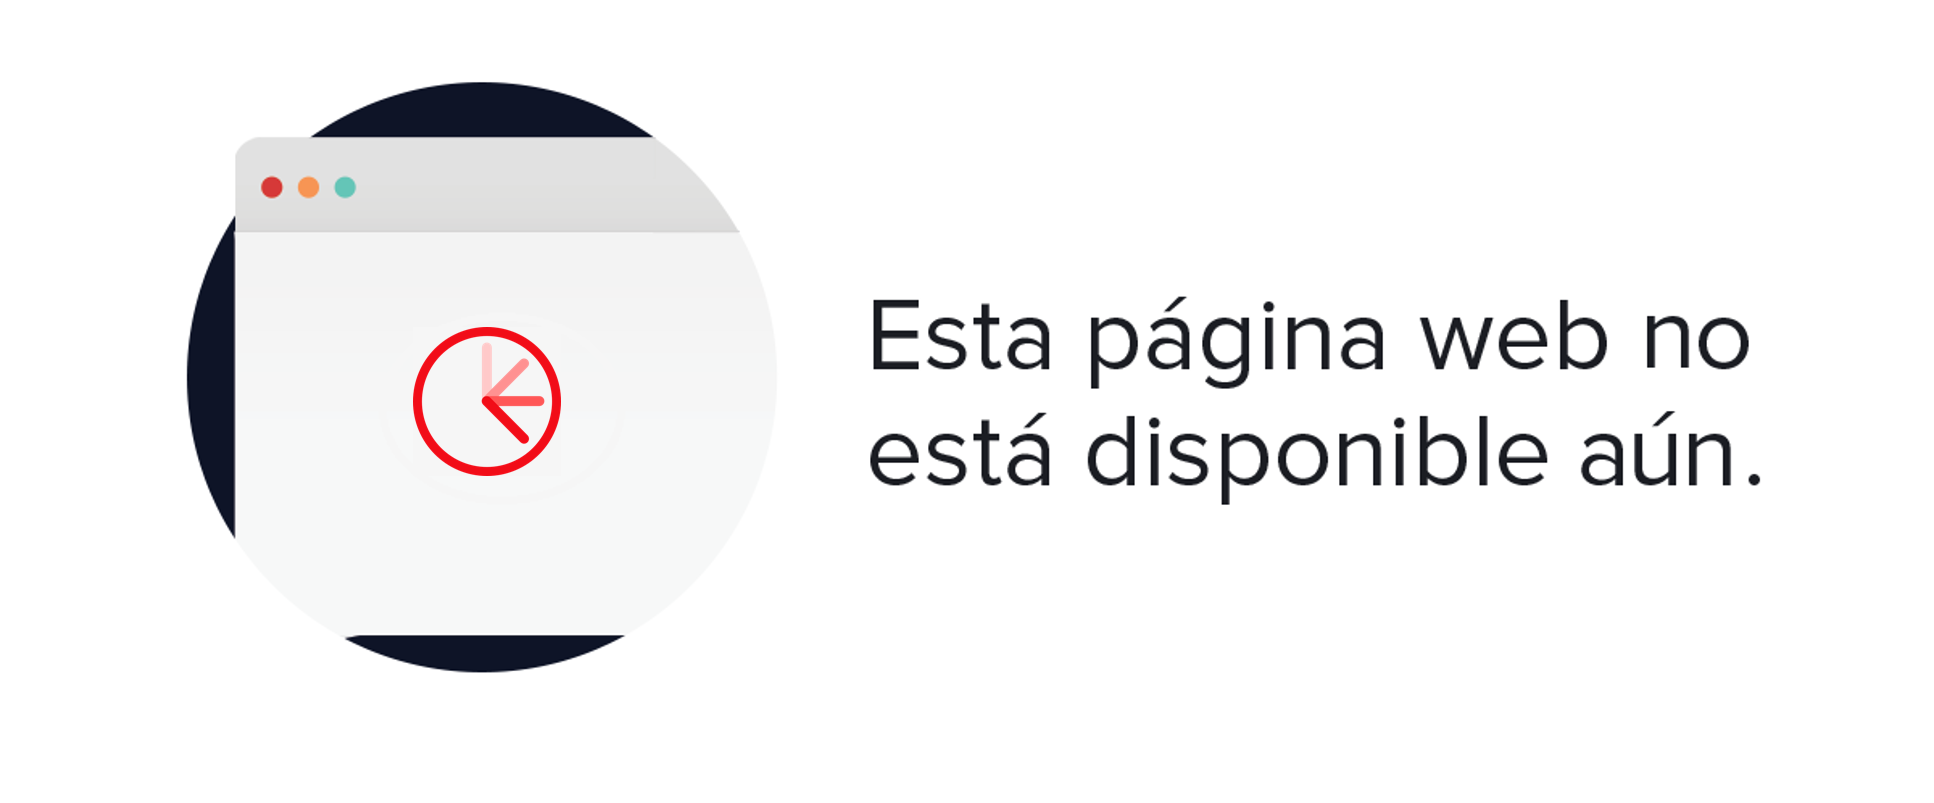 OXXO - Pantalón de mujer OXXO pitillo y tobillero Negro 8681613119796 - ORSQEPW